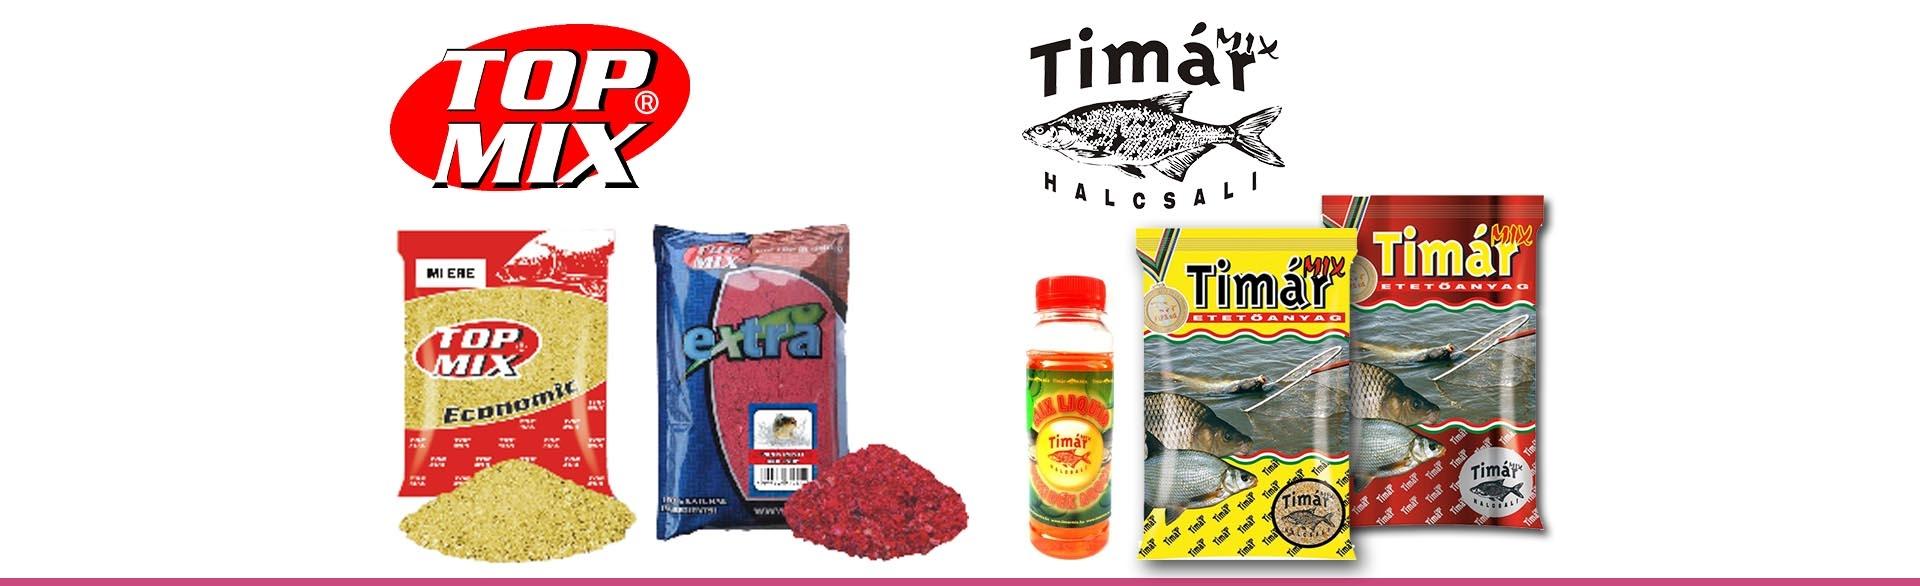 banner topmix timar